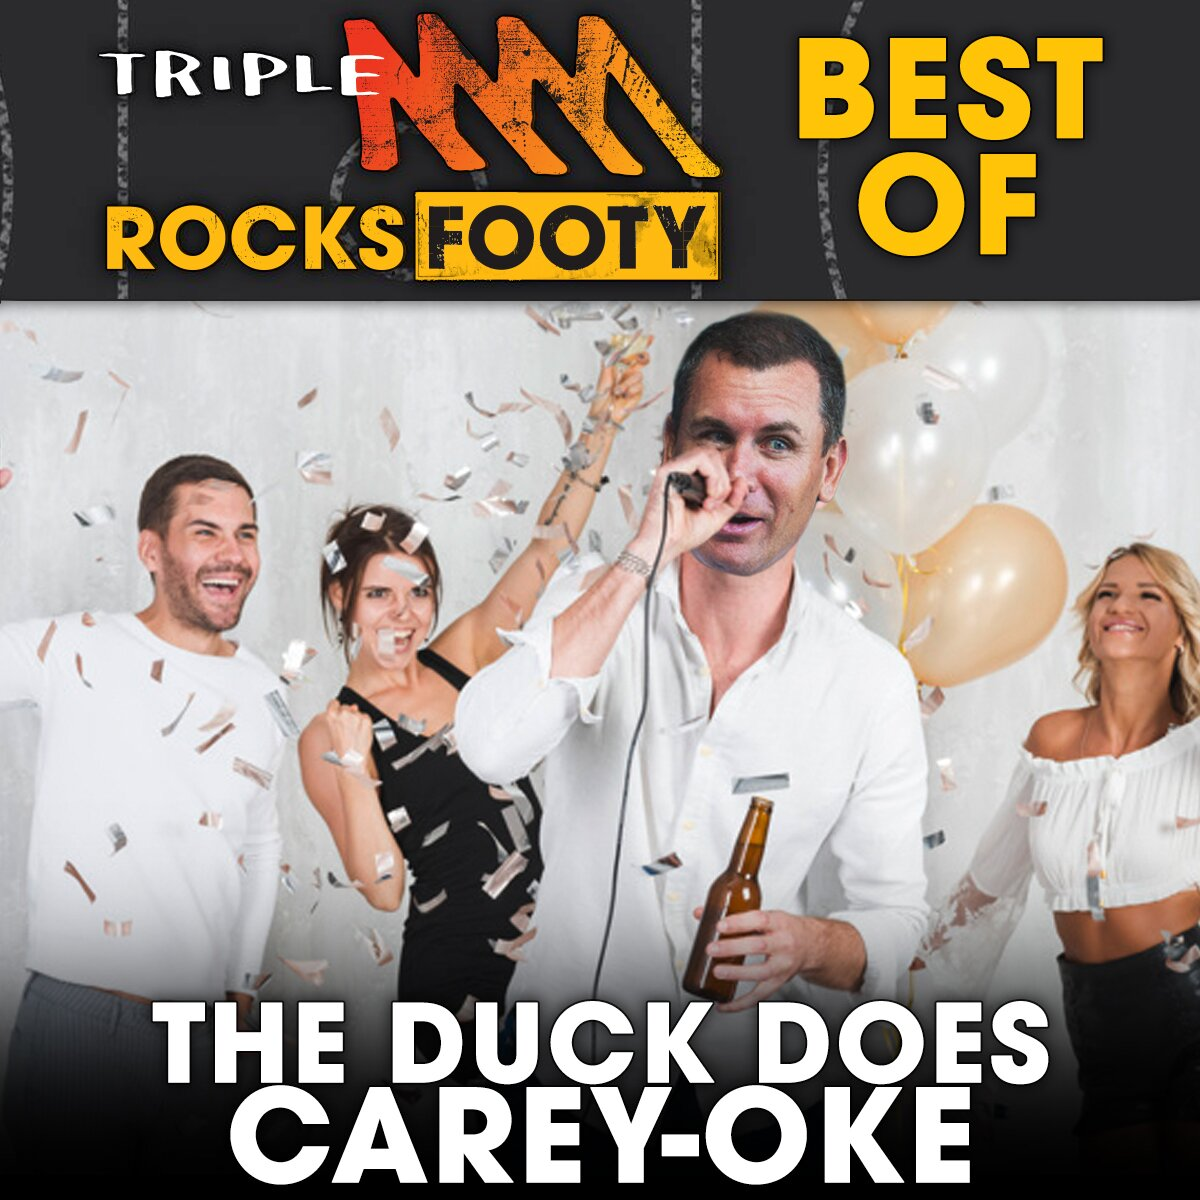 BT's secret audio of Duck singing karaoke